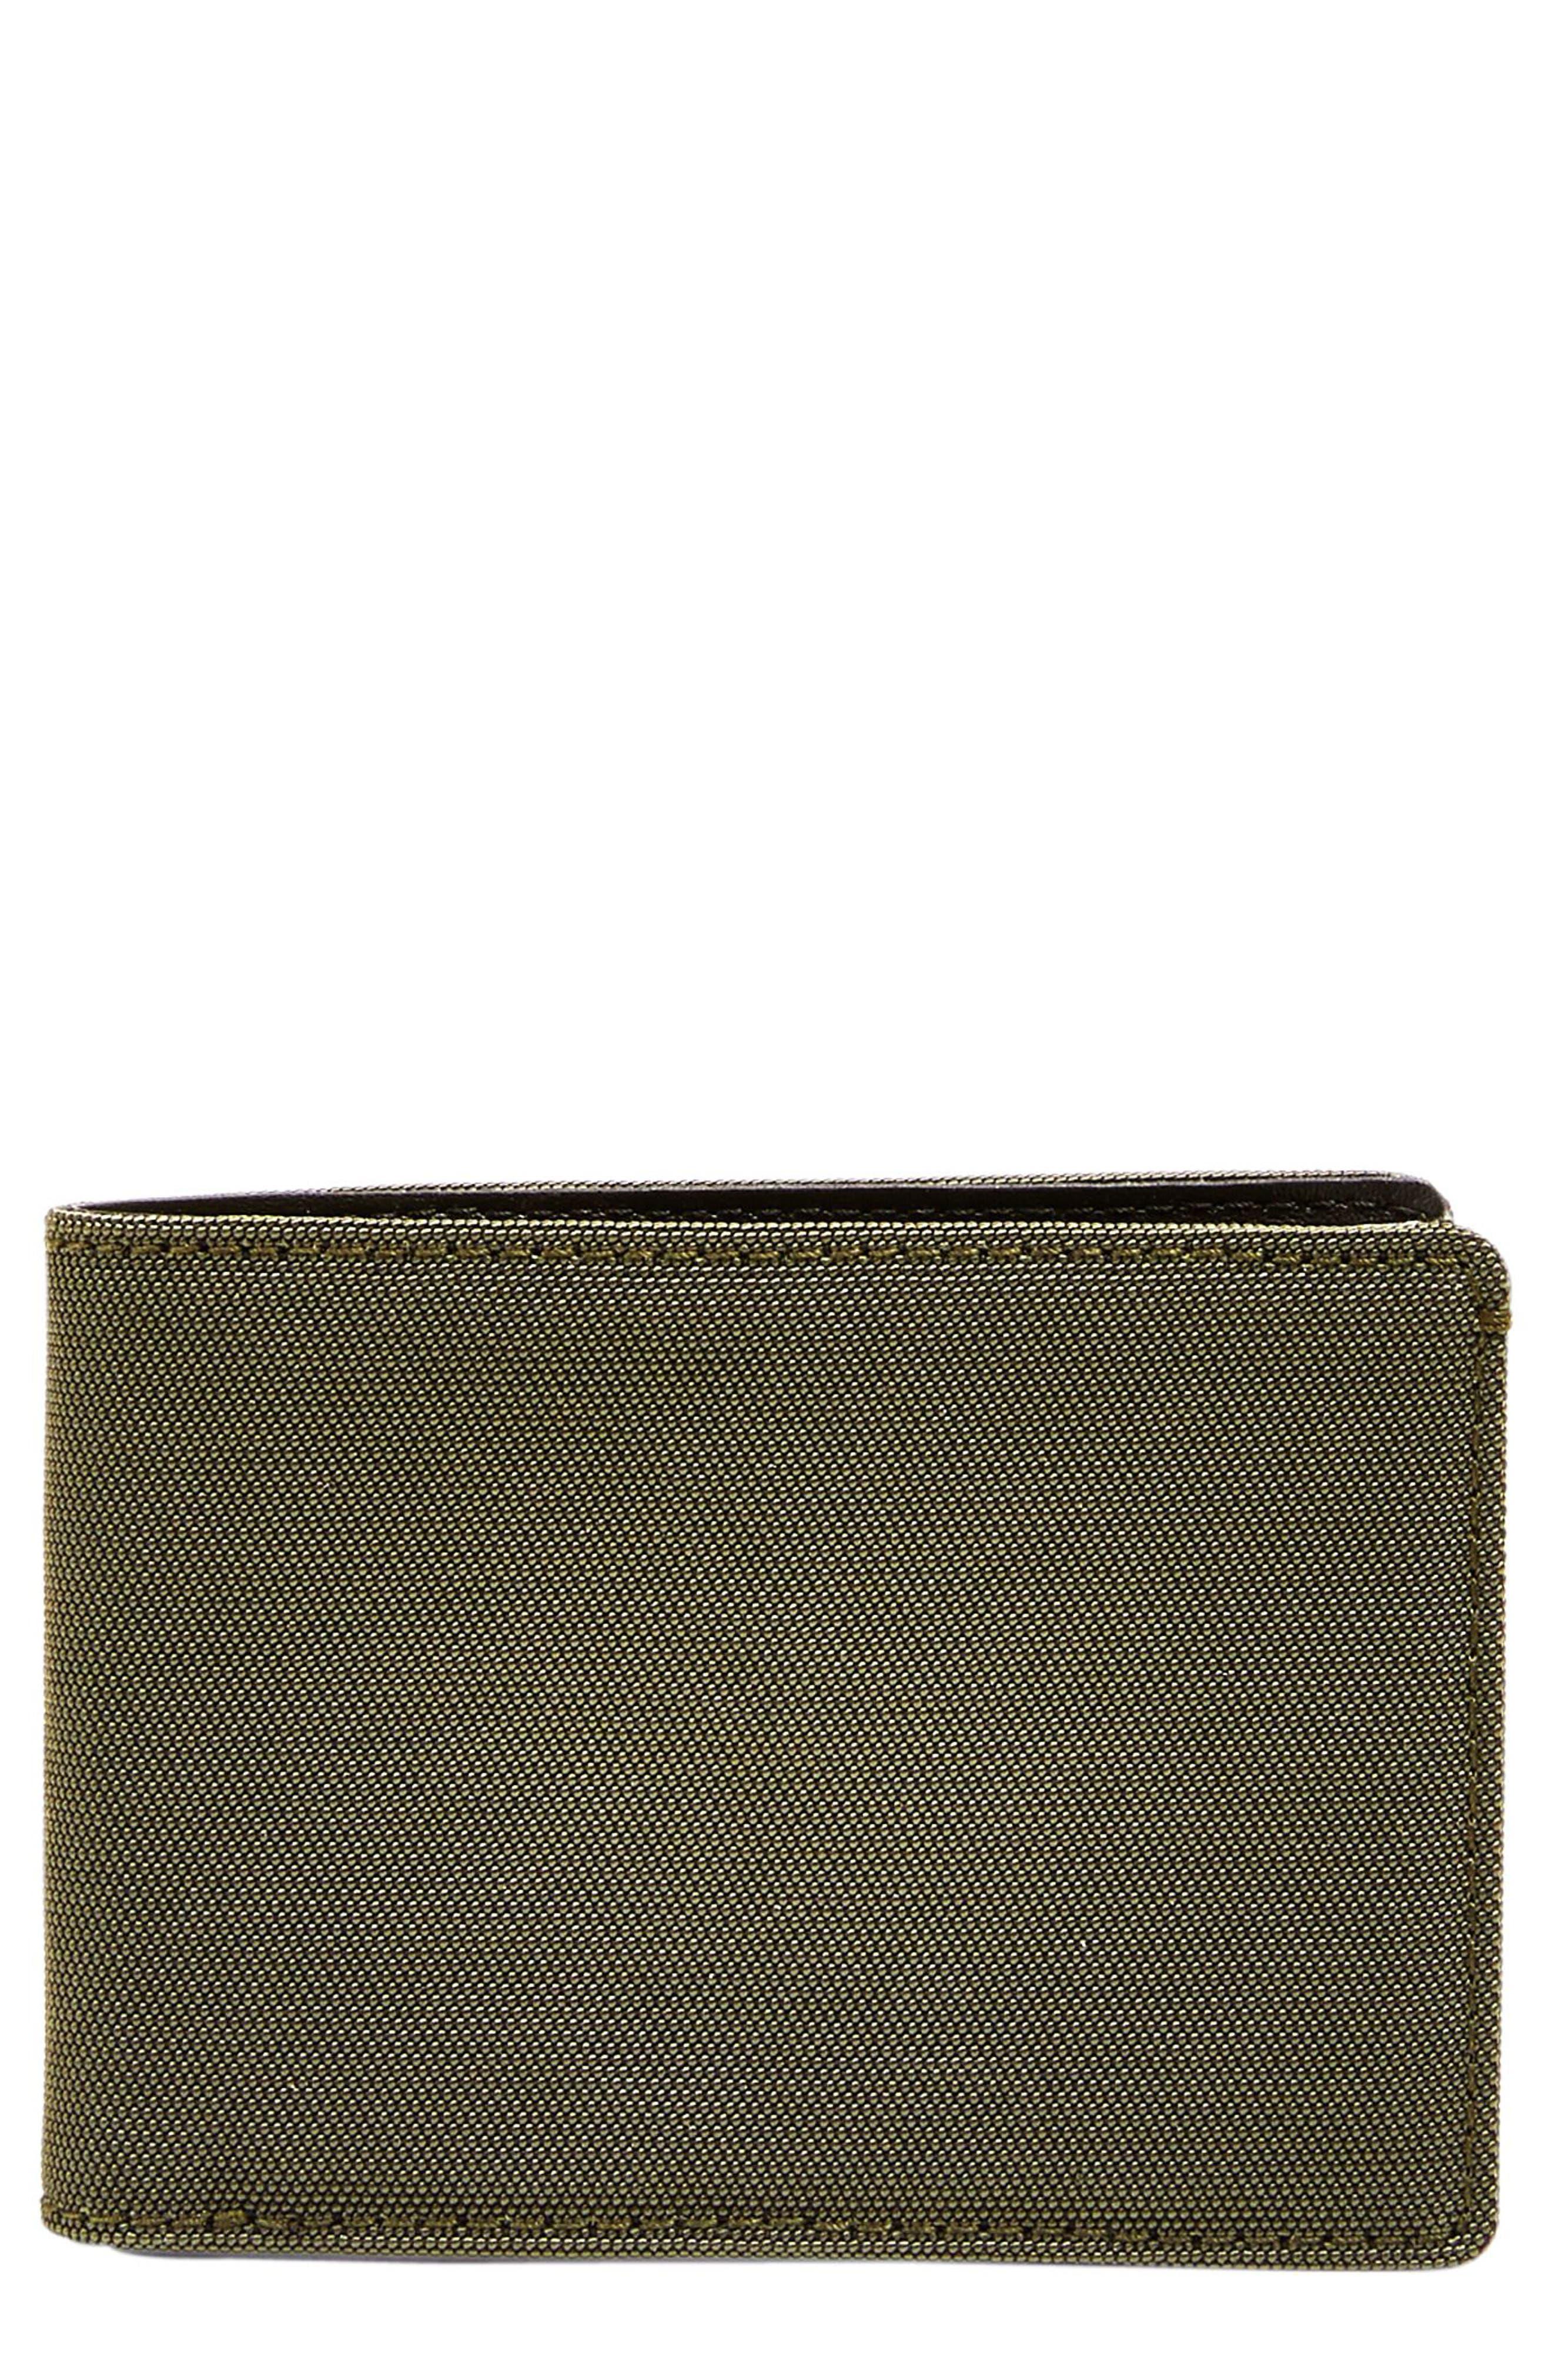 Bifold Wallet,                         Main,                         color, 348